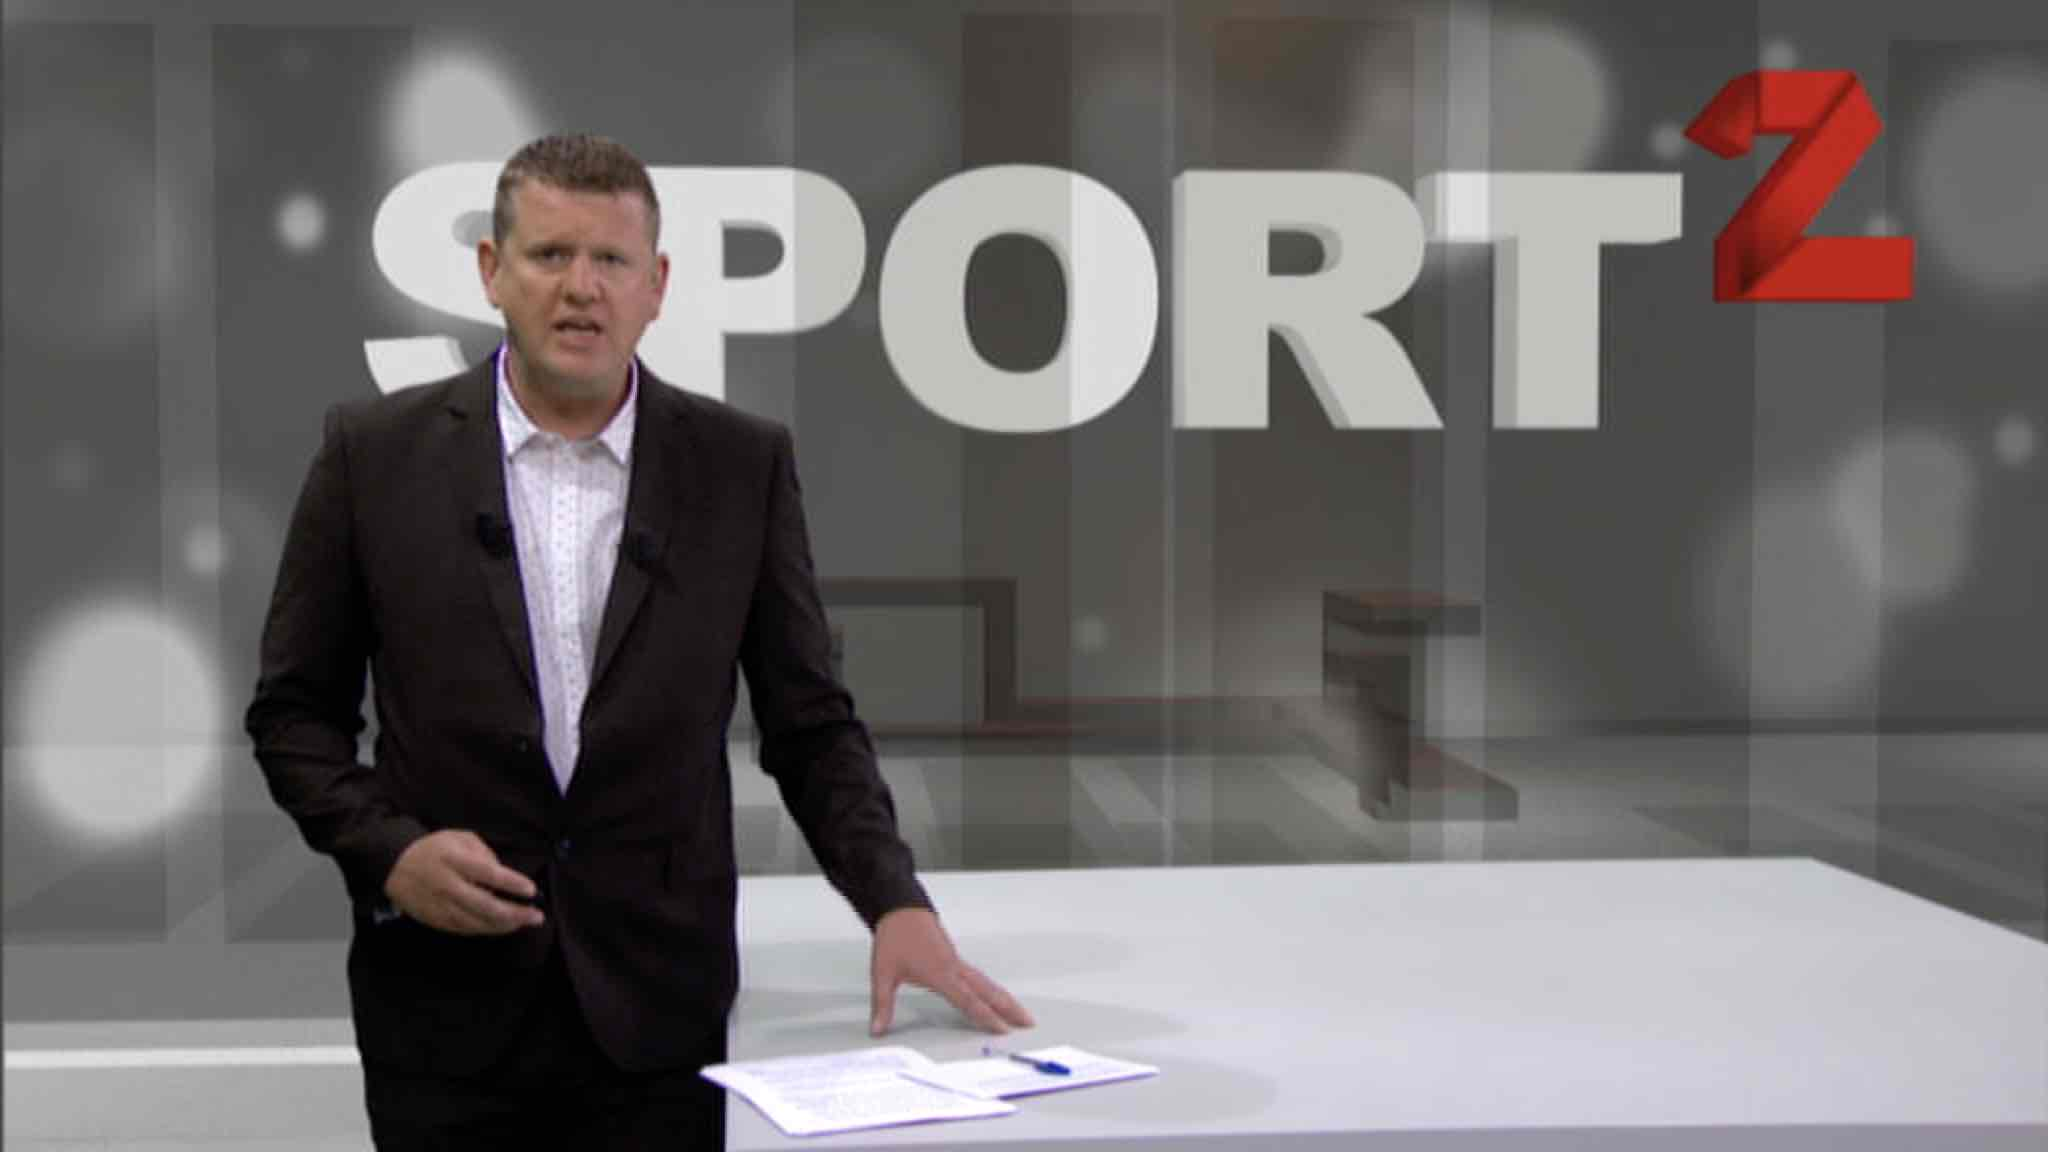 Sport2 - 06/04/18